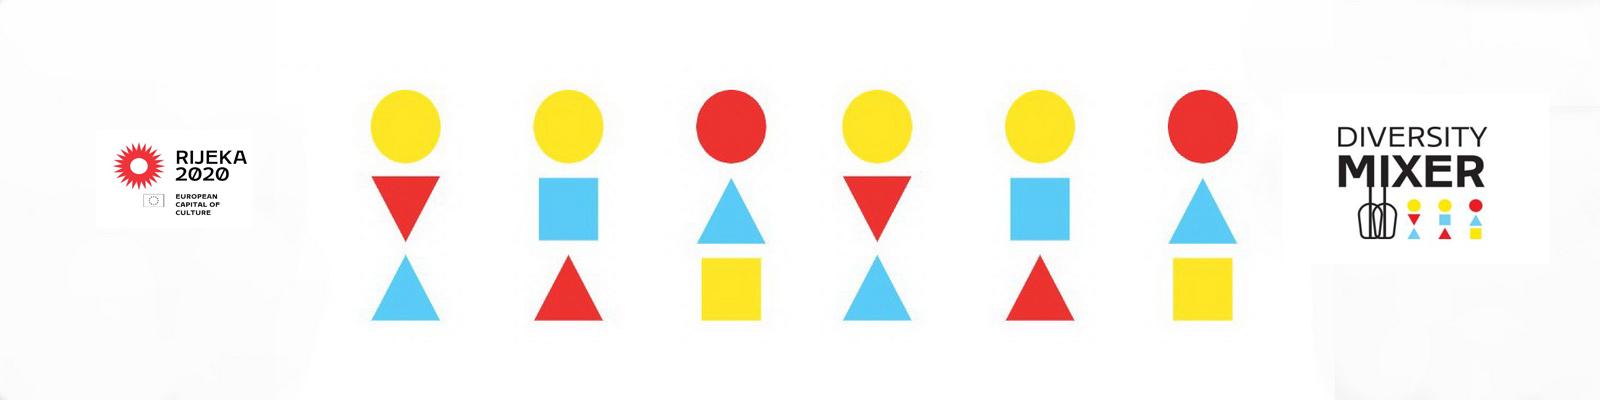 Diversity Mixer konferencija Rijeka 2020